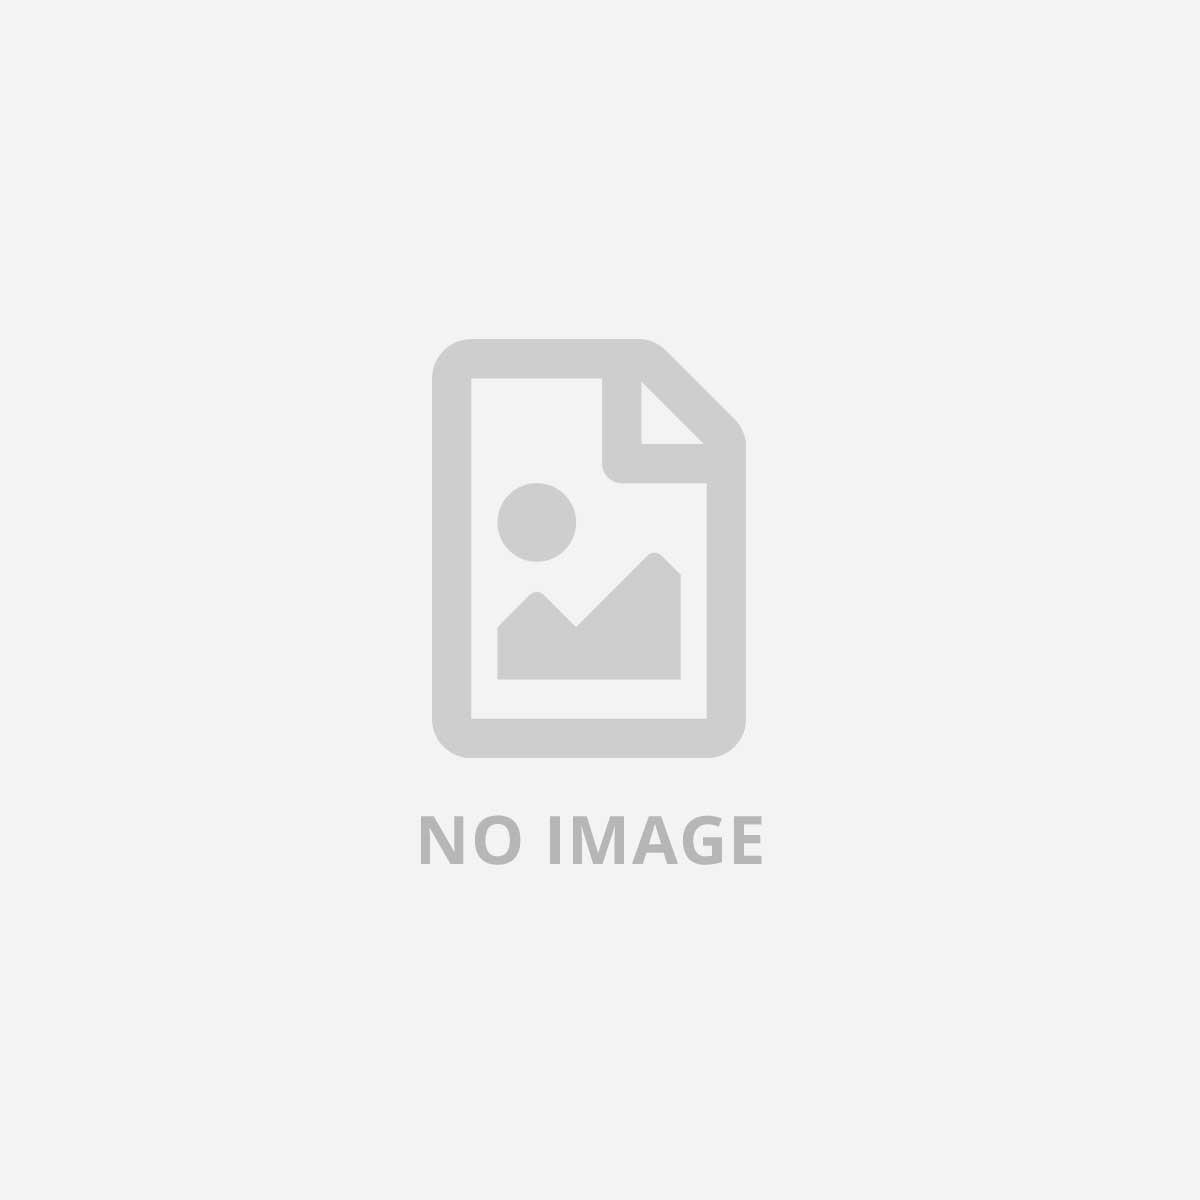 CANON PIXMA TS3351 EUR WHITE